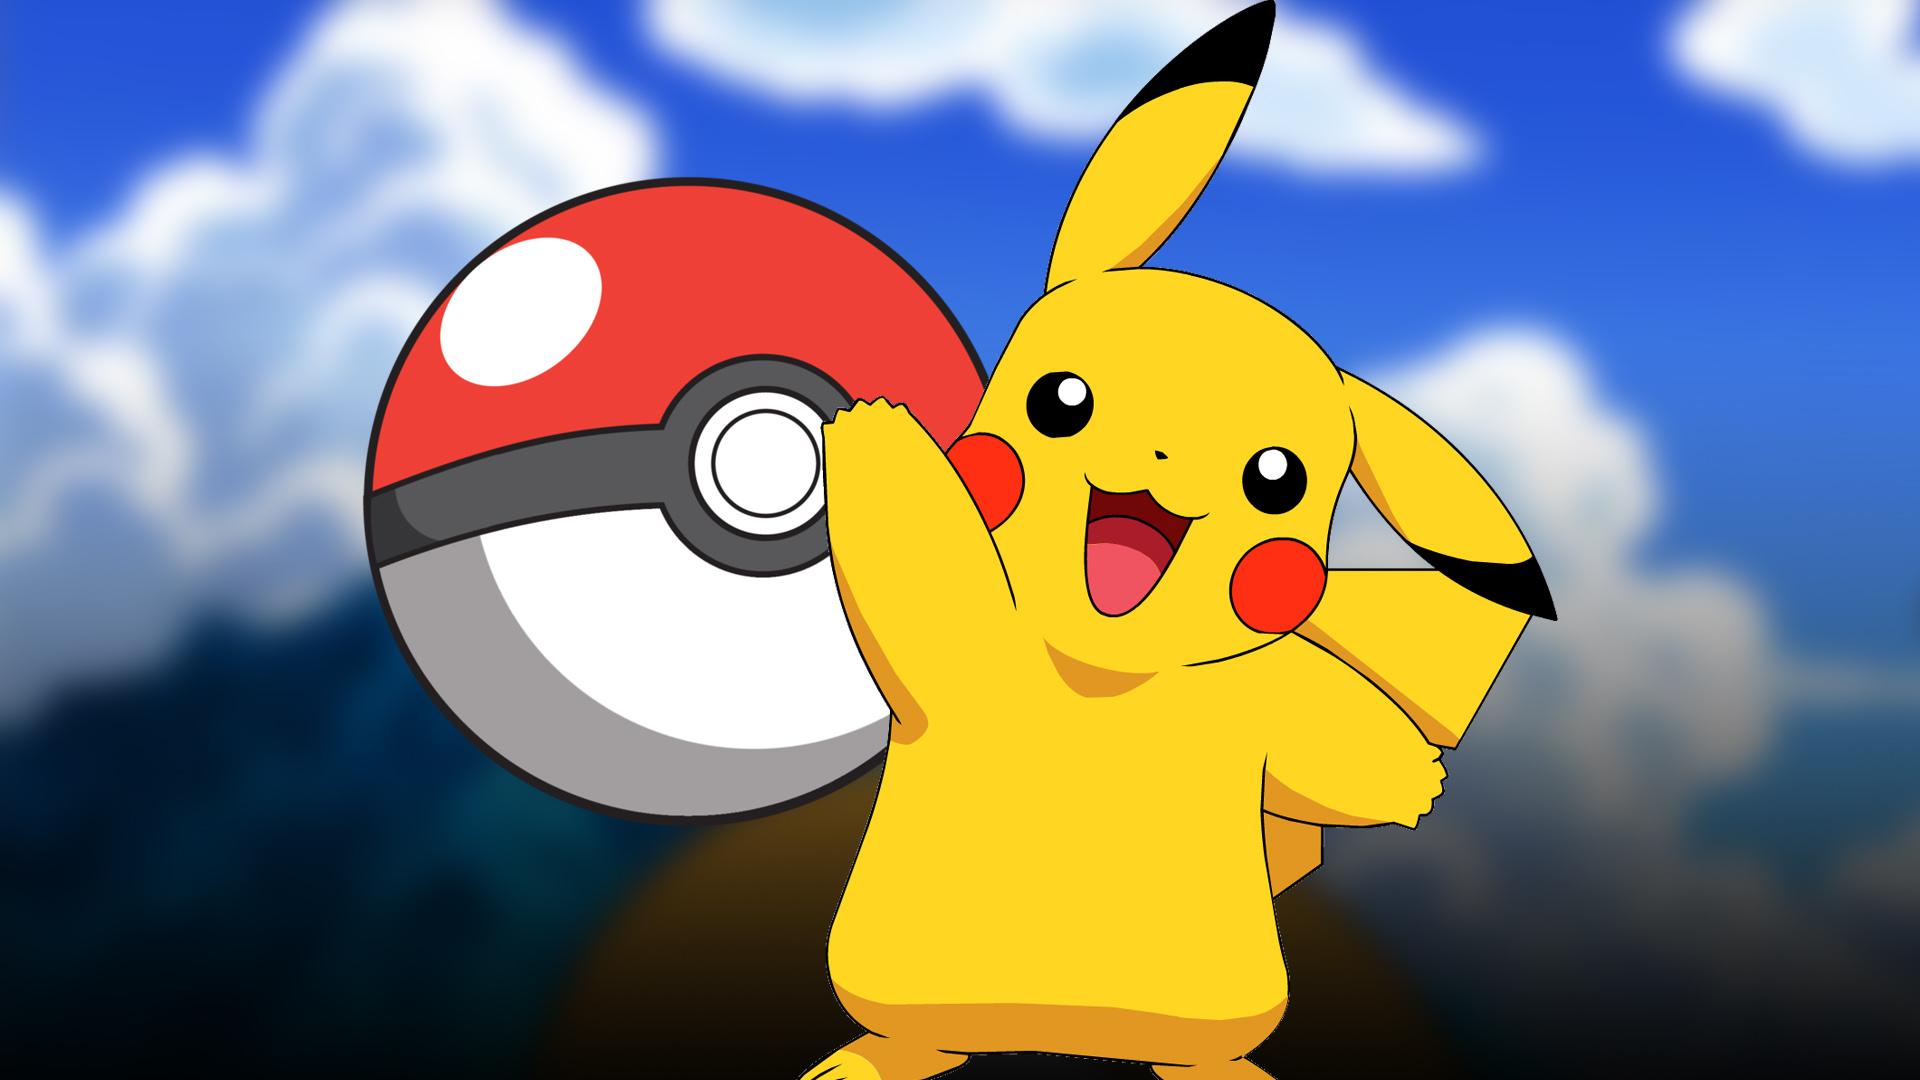 Catch a Pikachu wearing a party hat in Pokémon GO for Pokémon Day | Nintendo Wire